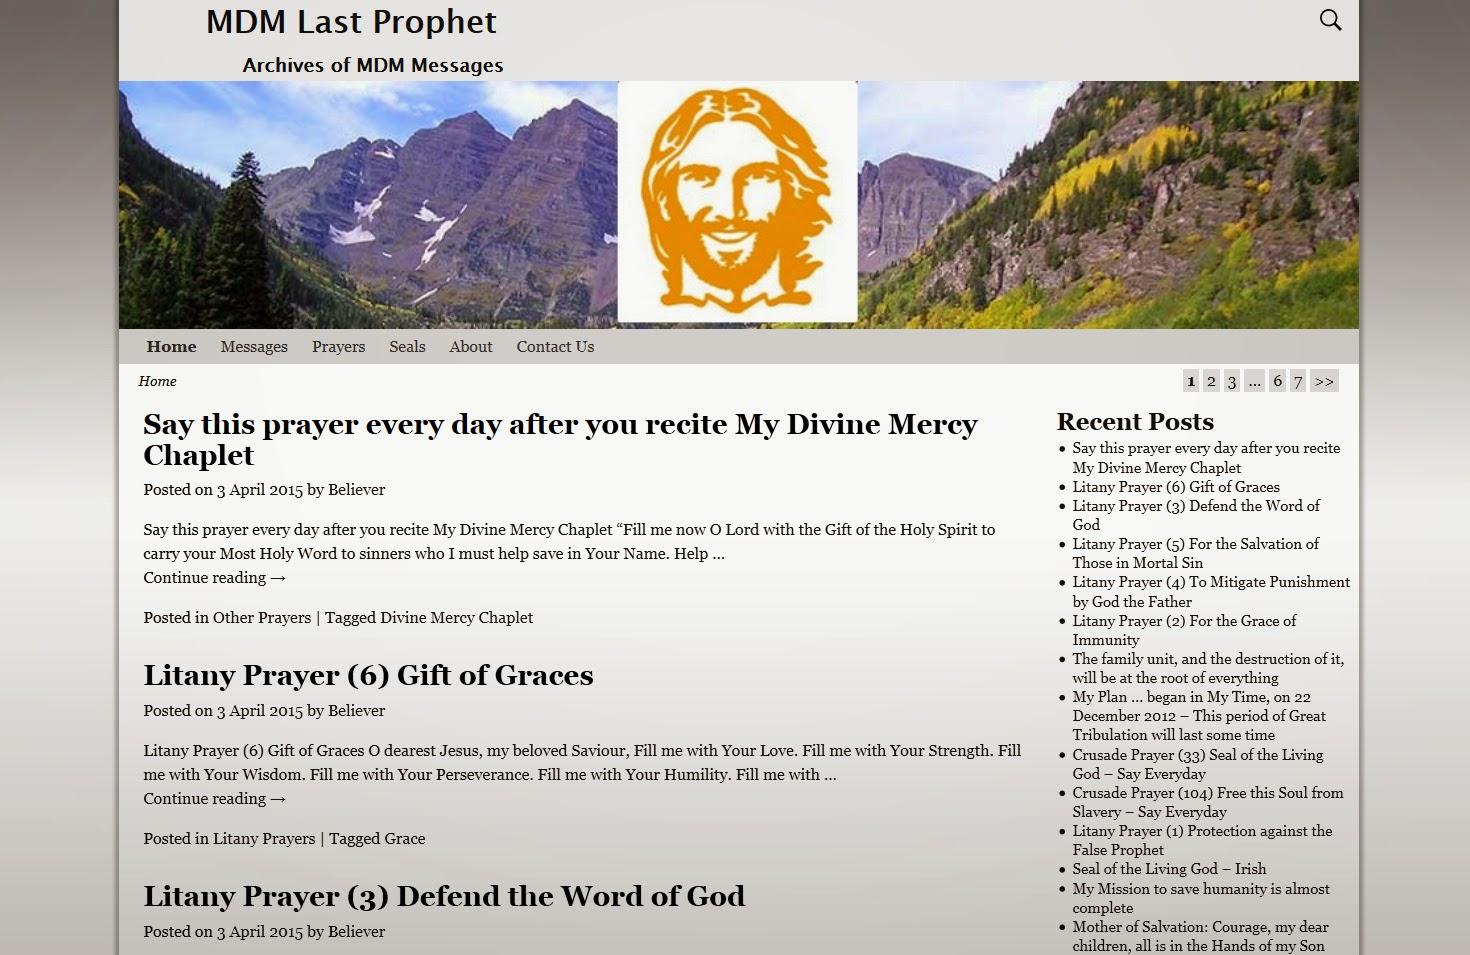 MDM Last Prophet